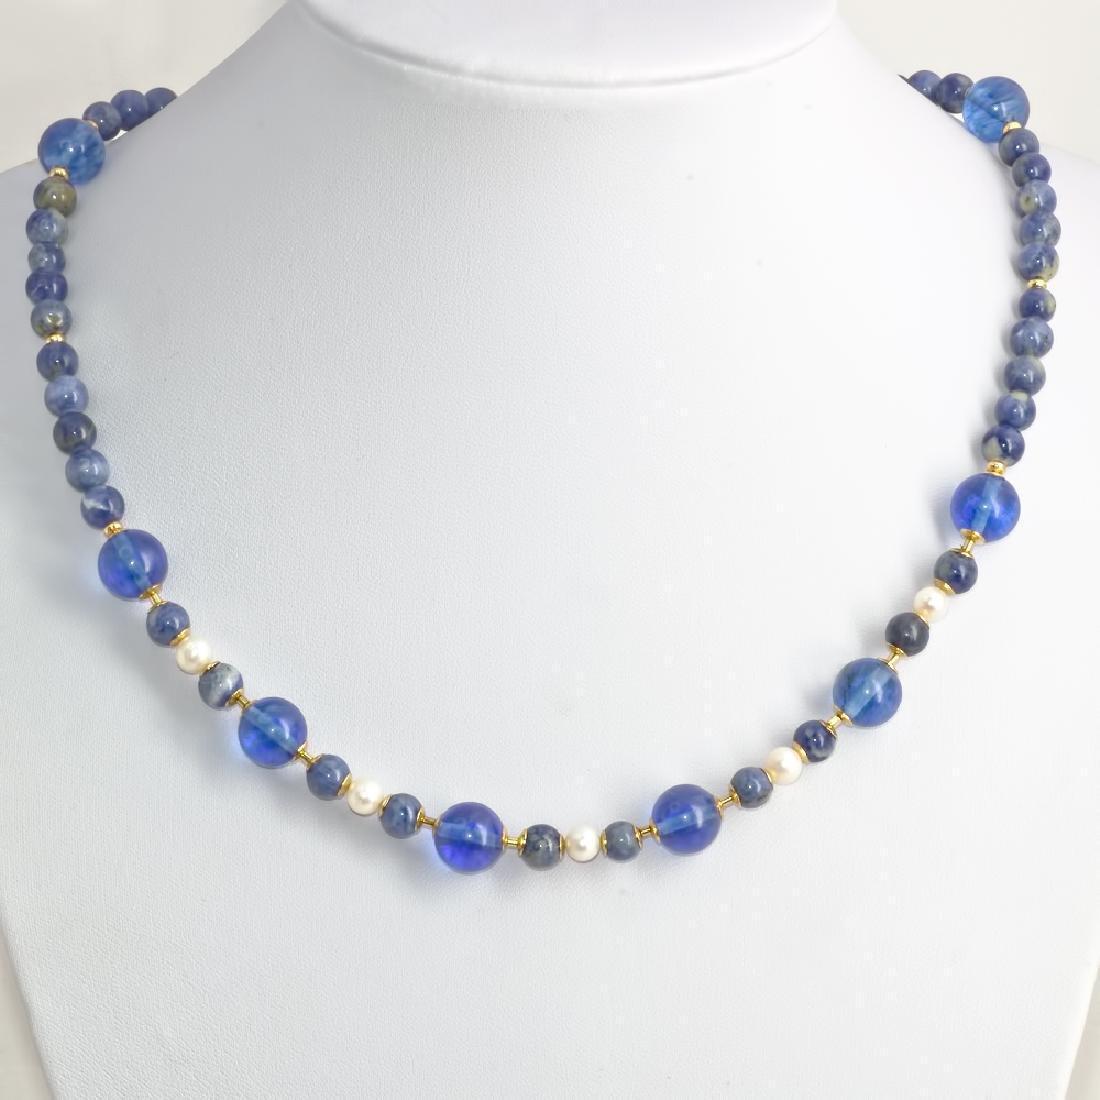 Sodalite and Capri quartz necklace with Pearls